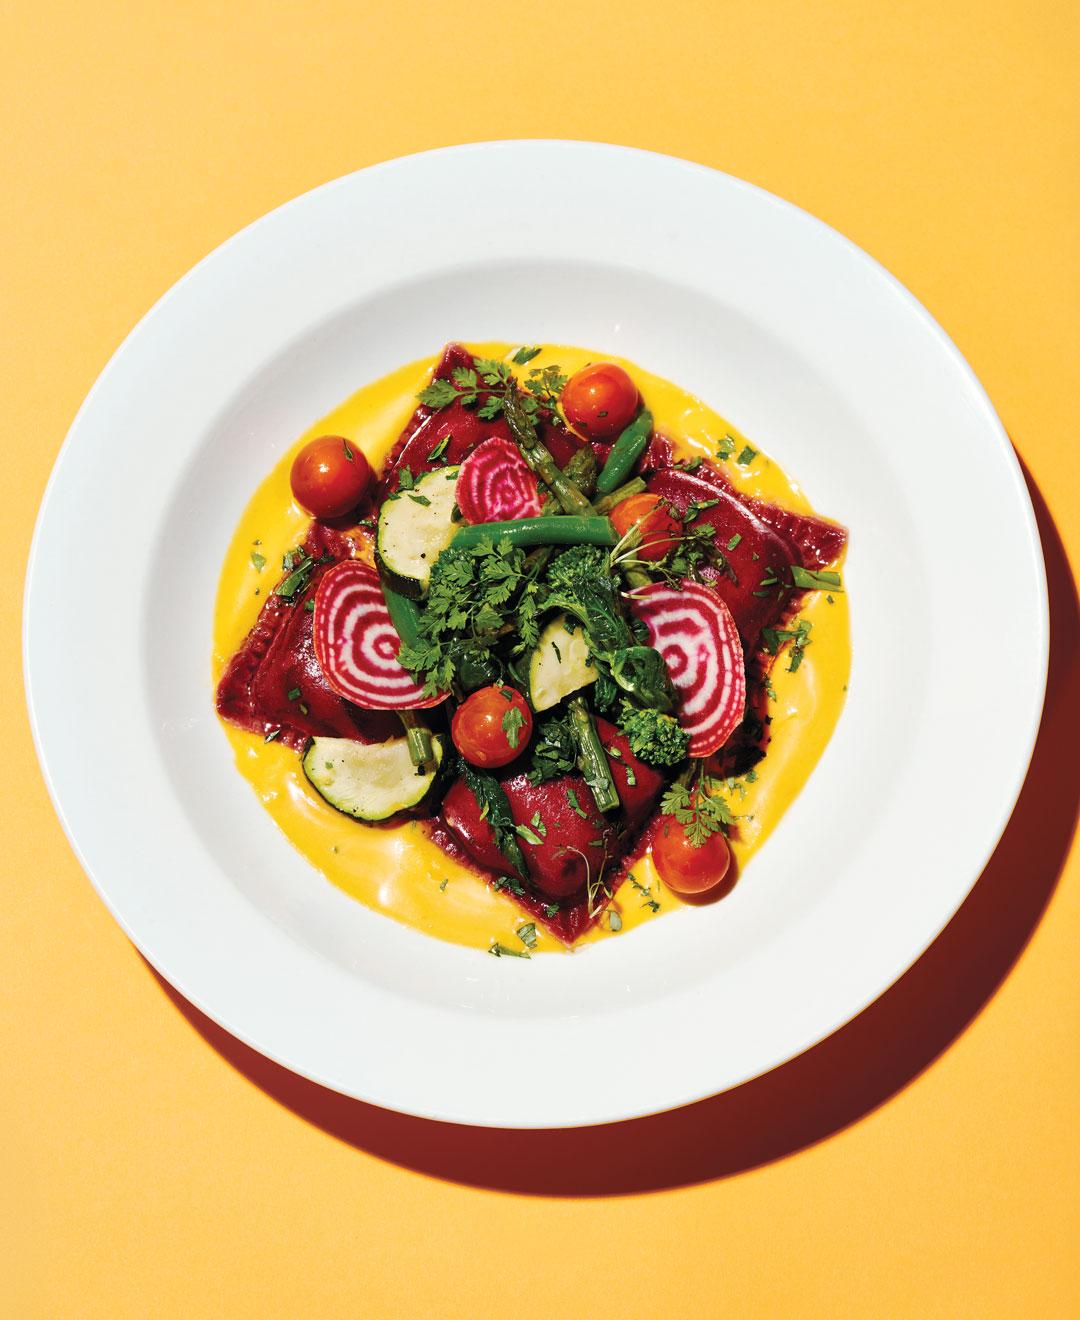 vegan food restaurants philadelphia